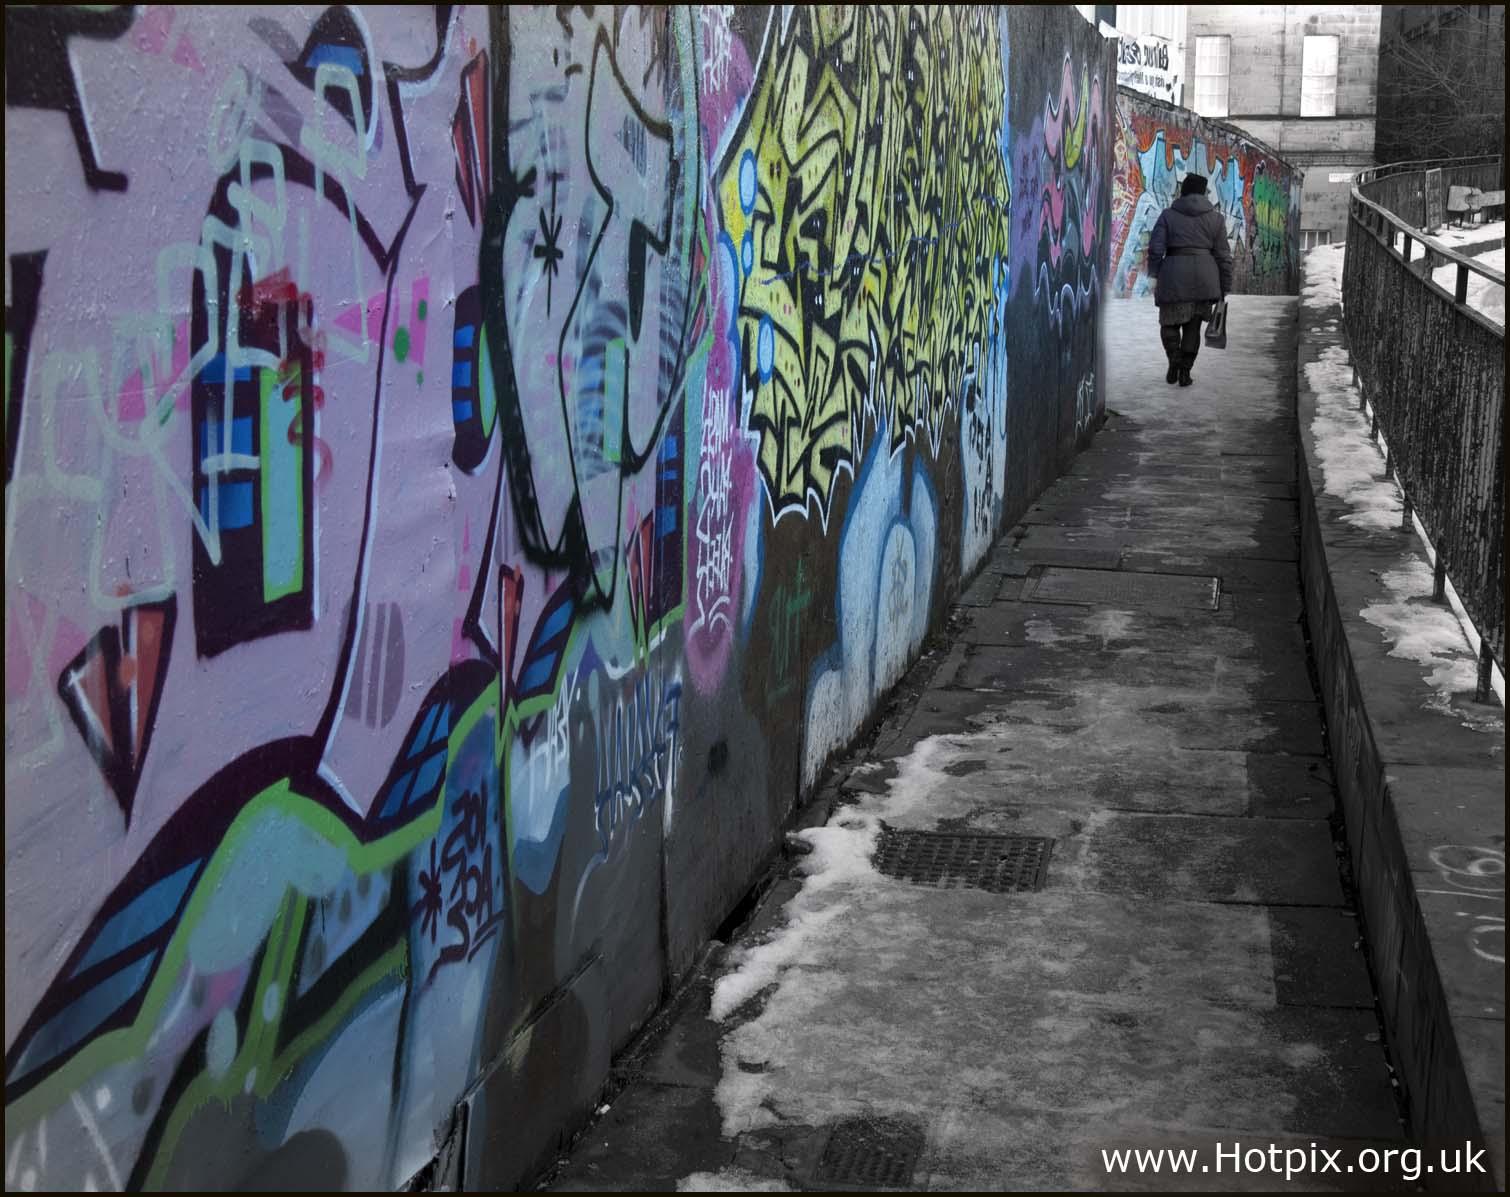 lonely,walk,loneliness,graffitti,grafitti,inner,city,housing,estate,sink,social,deprevation,deprivation,ice,snow,concrete,urban,decay,grey,gray,selective,color,colour,black,white,selctive,colores,tonysmith,tony,smith,dark,disturbia,interesting,place,places,selectivo,couleur,s\u00e9lective,vorgew\u00e4hlte,Farbe,art,arty,graffiti,grafiti,street,edinburgh,scotland,lotian,lothian,lothians,UK,life,edinbrugh,hotpix!,Edinburg,tony smith photography,tdktony,tdk,tdktonysmith,#tonysmithhotpix,edimburgh